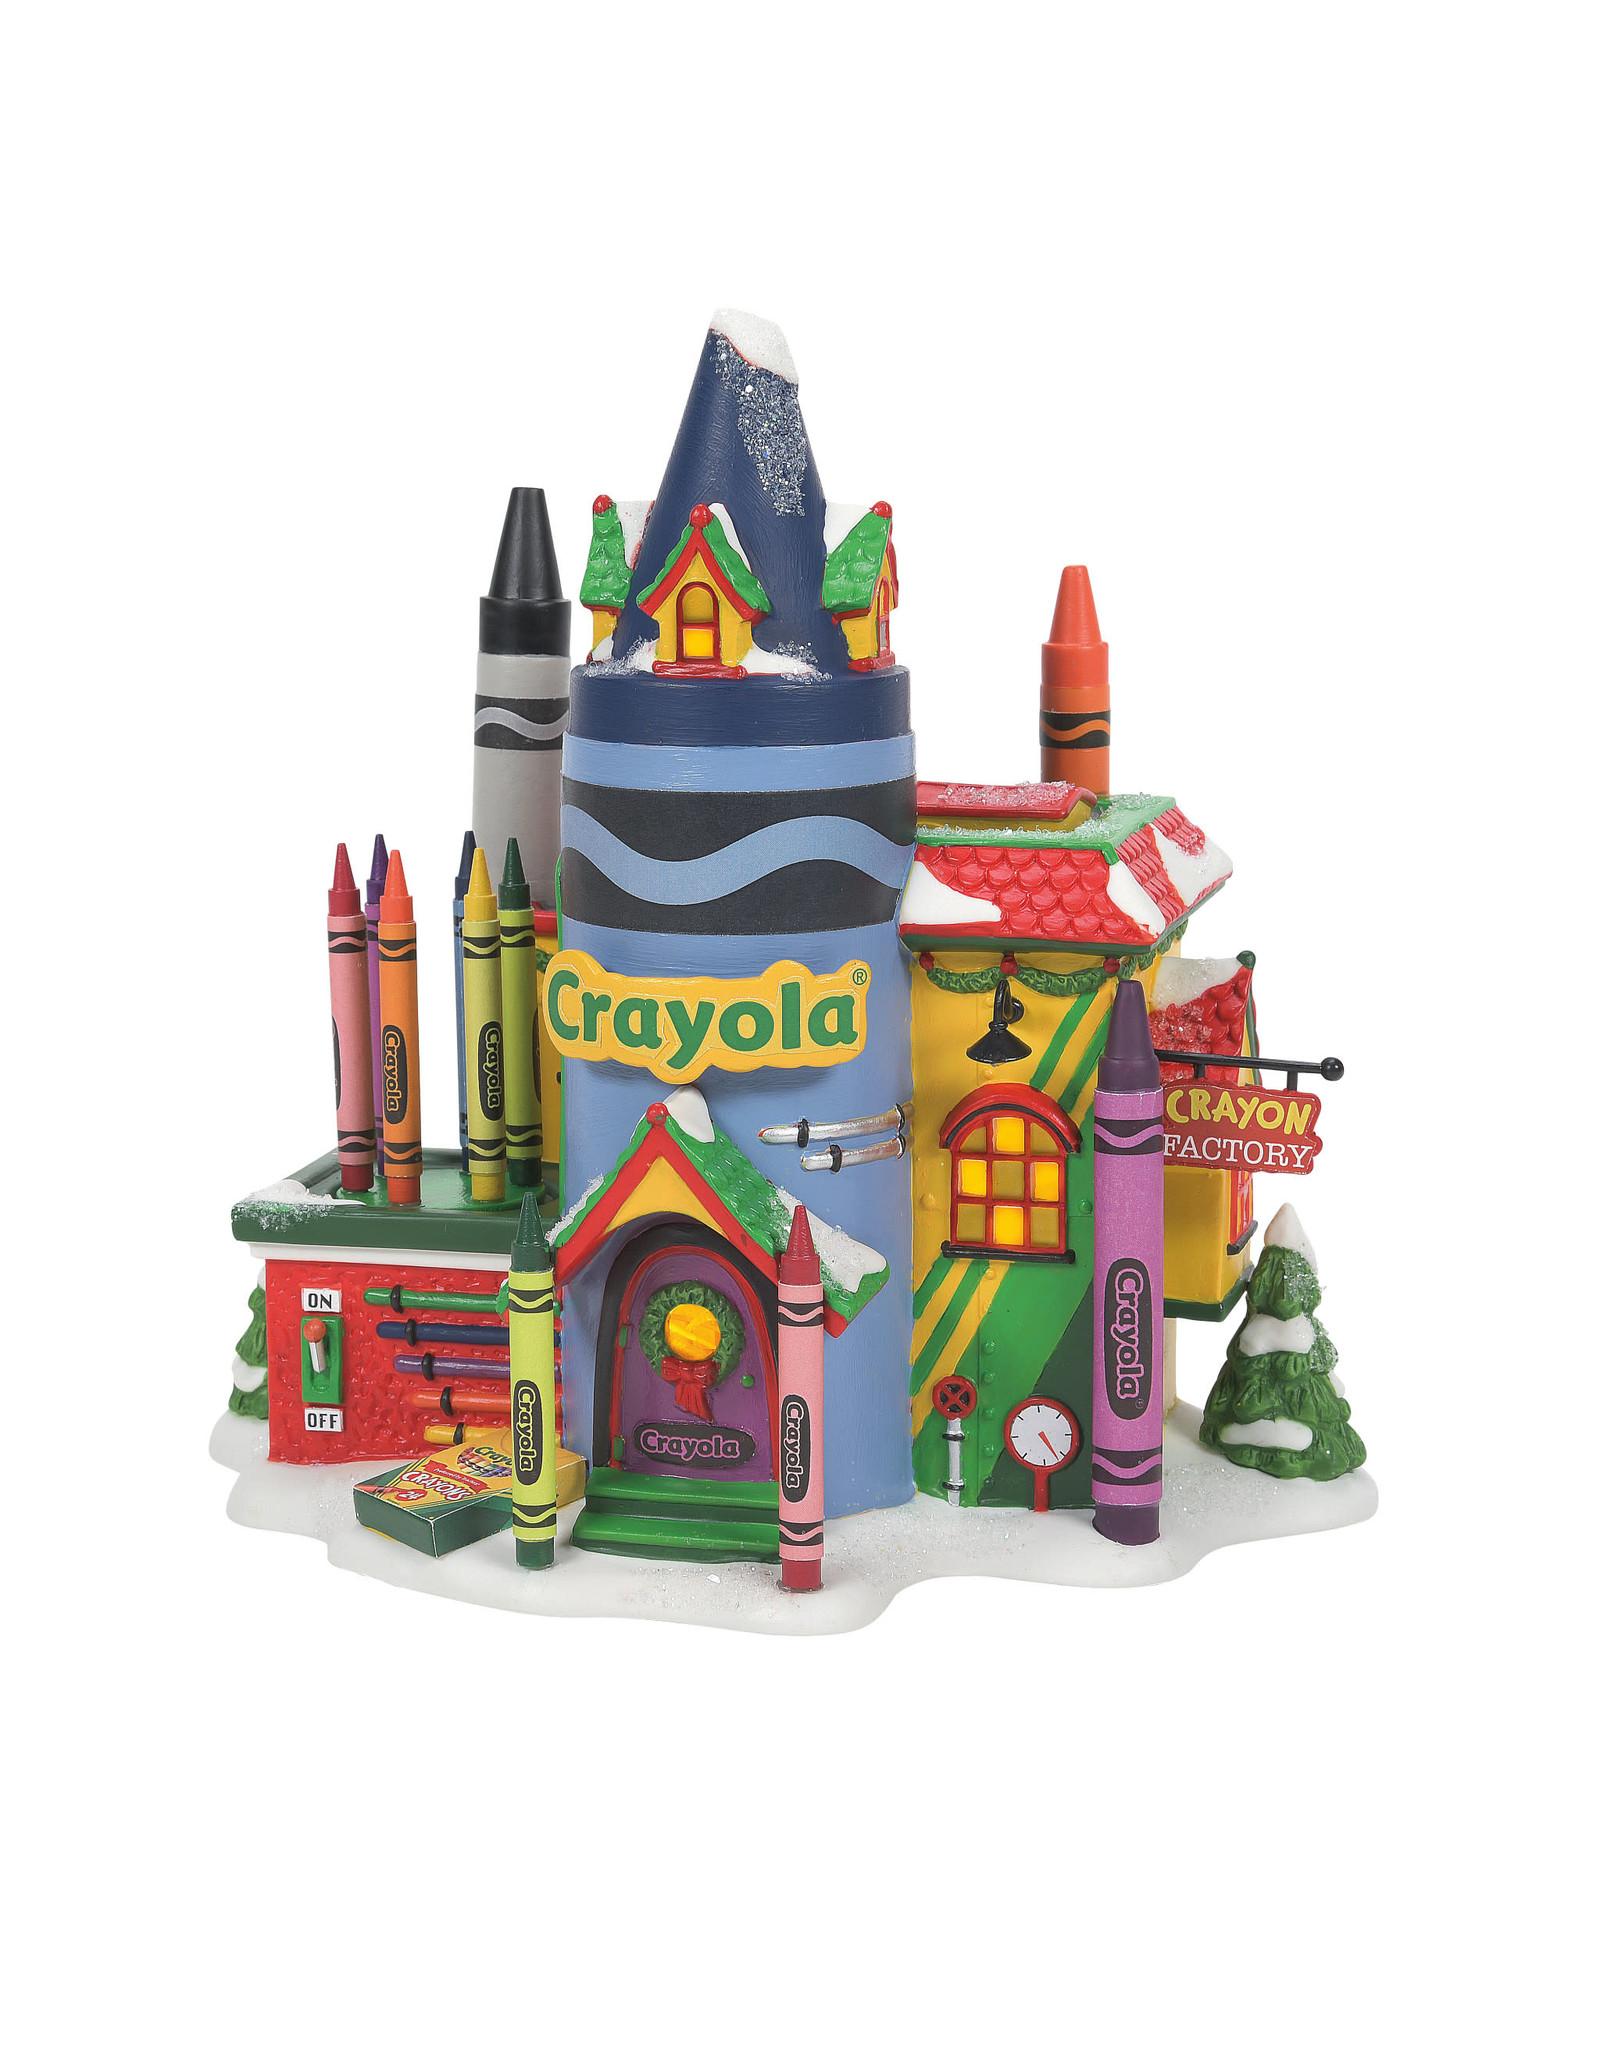 Department 56 Crayola Crayon Factory